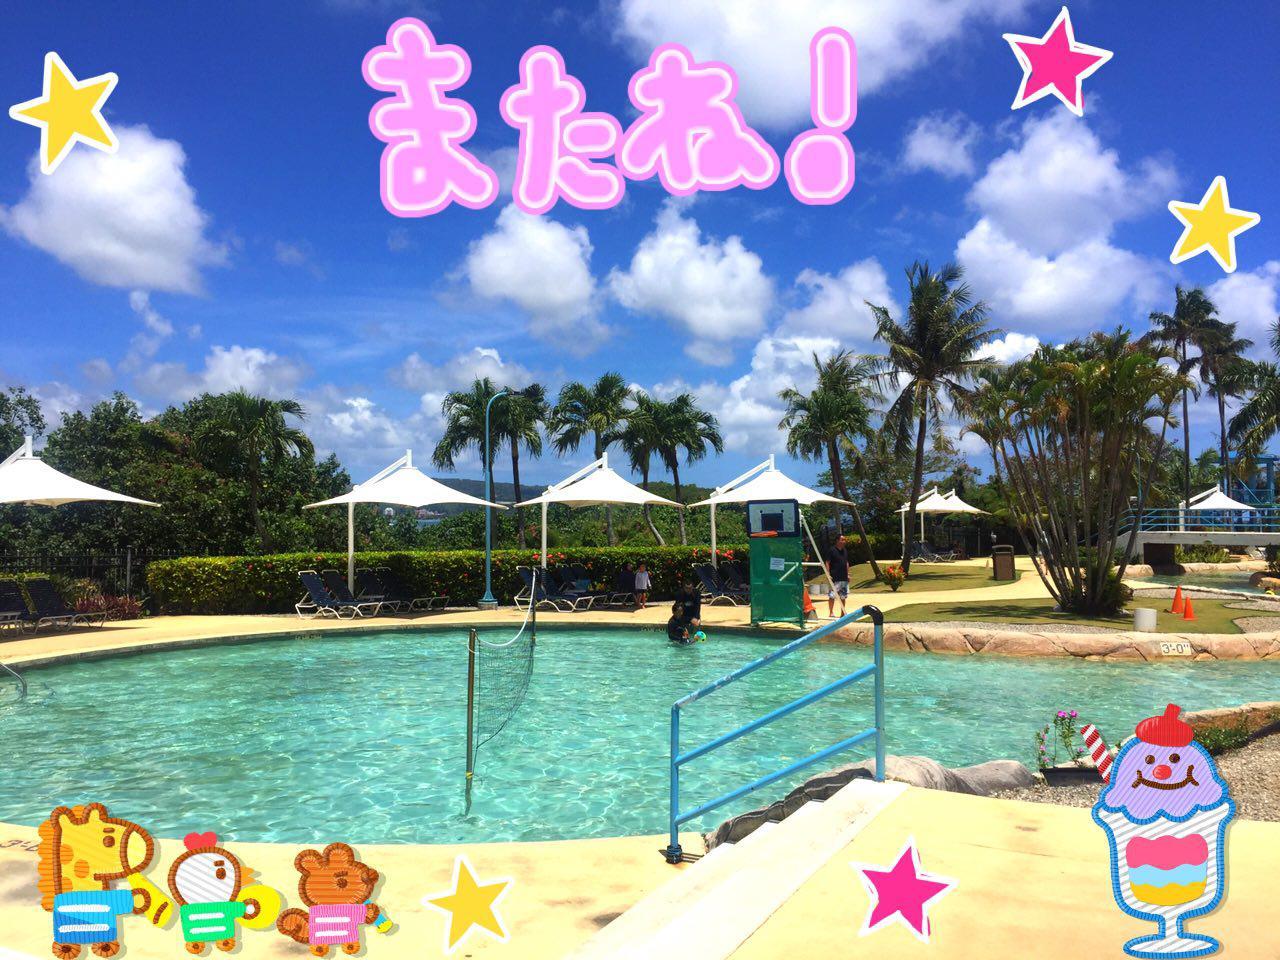 photo_2017-06-09_20-47-52.jpg